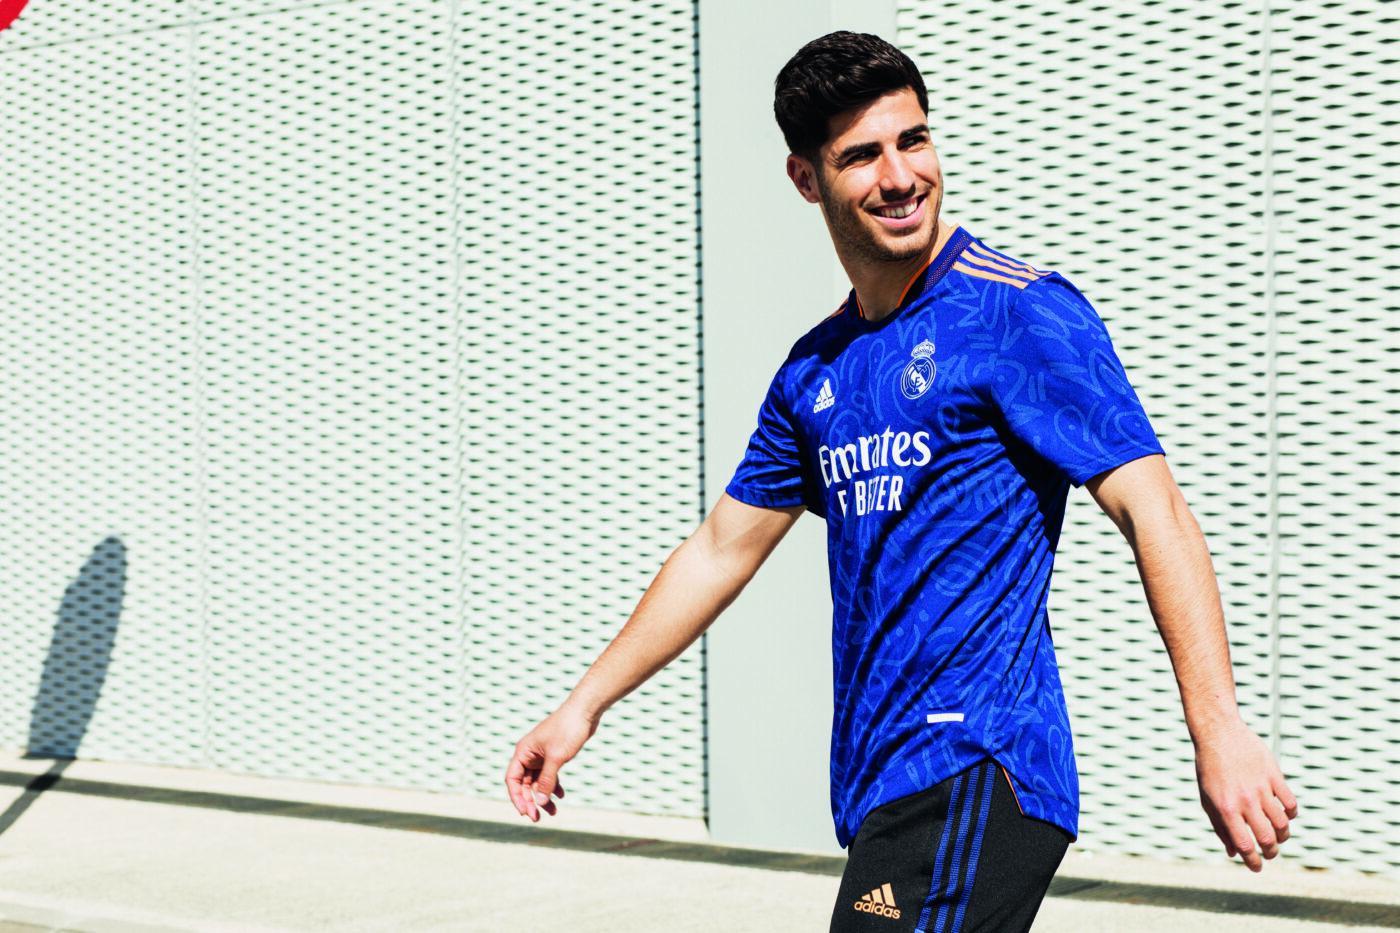 Maillot Real Madrid 2021-2022 extérieur adidas